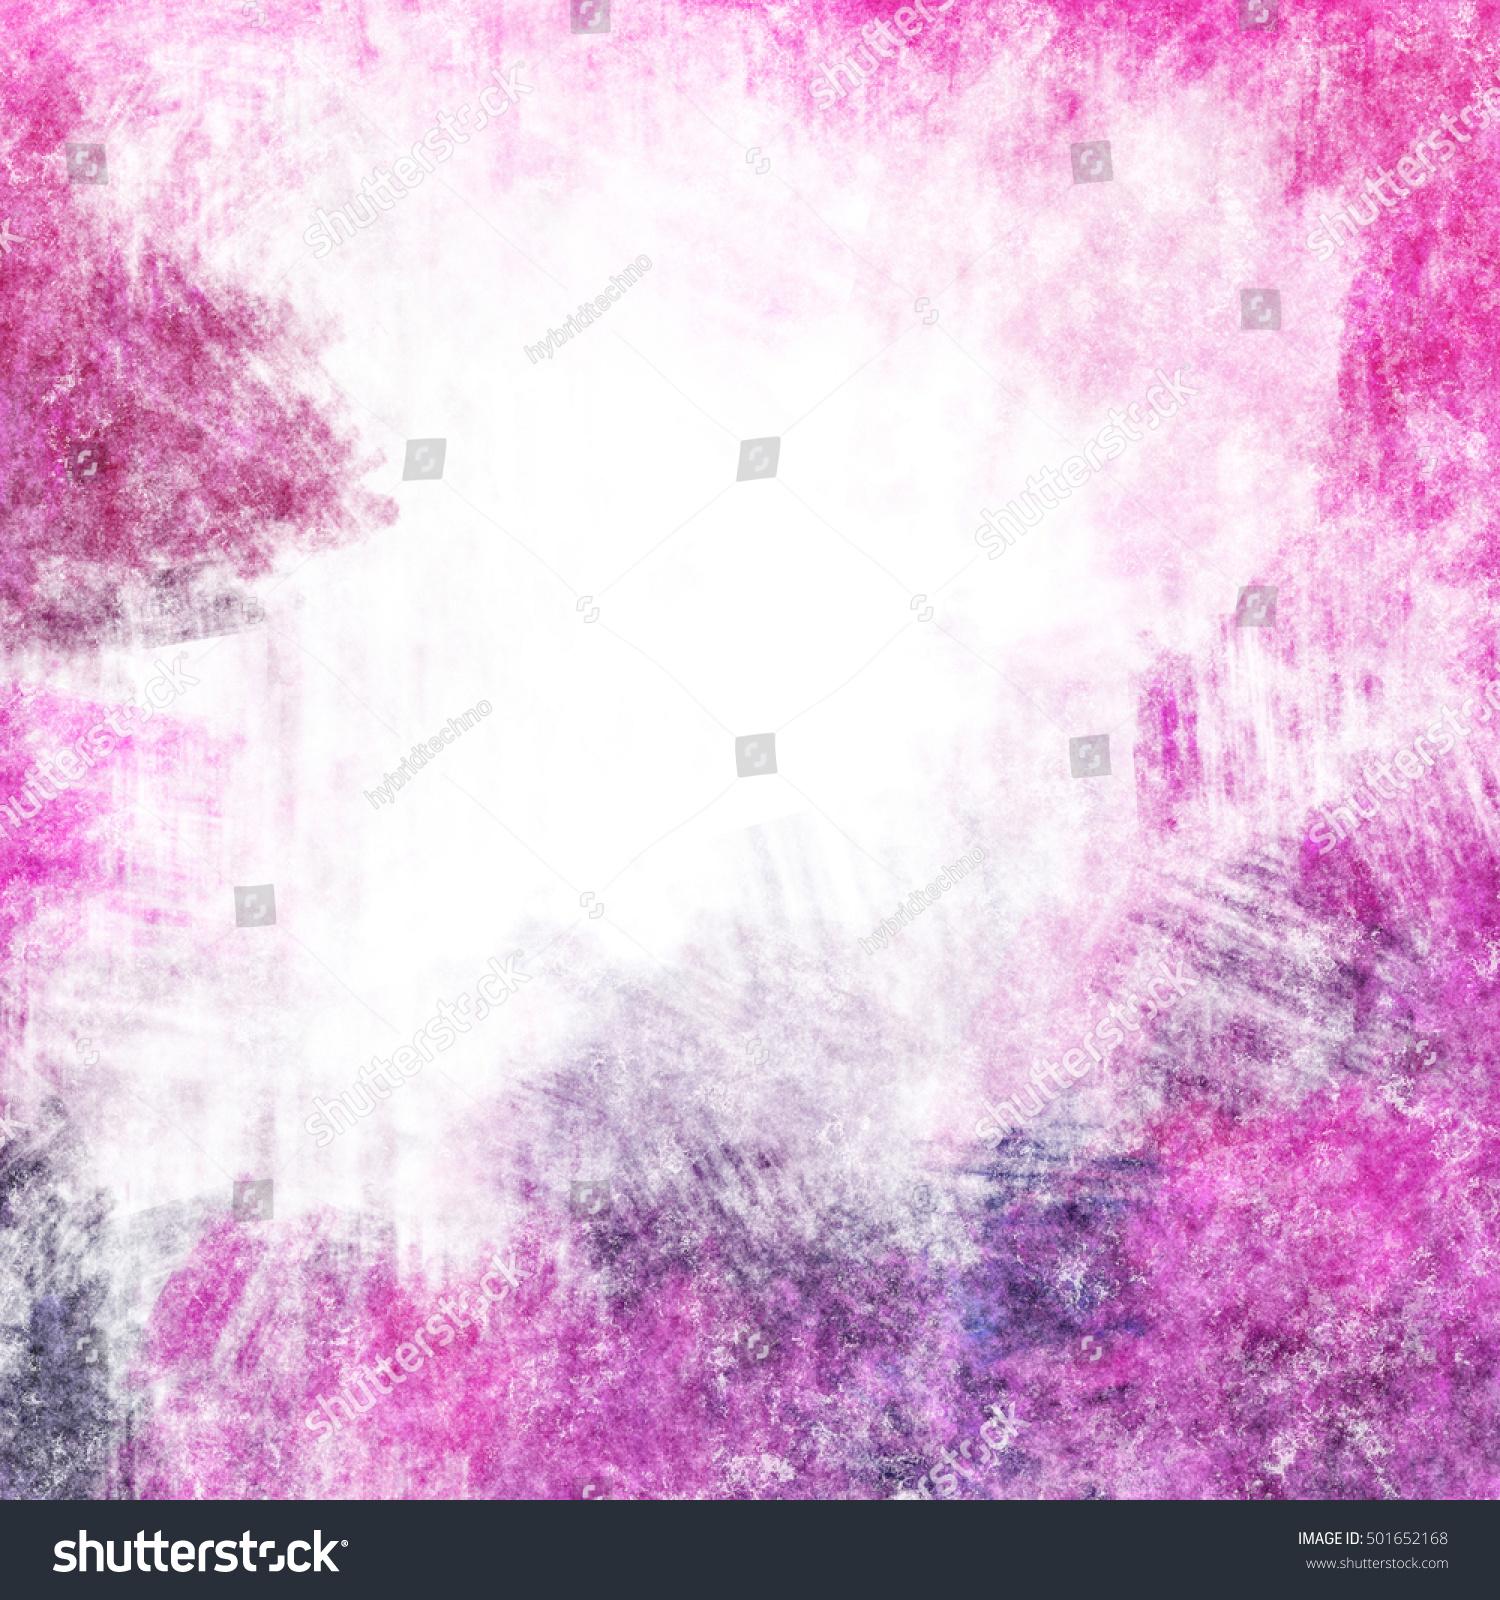 Colorful Framed Grunge Background Texture | EZ Canvas